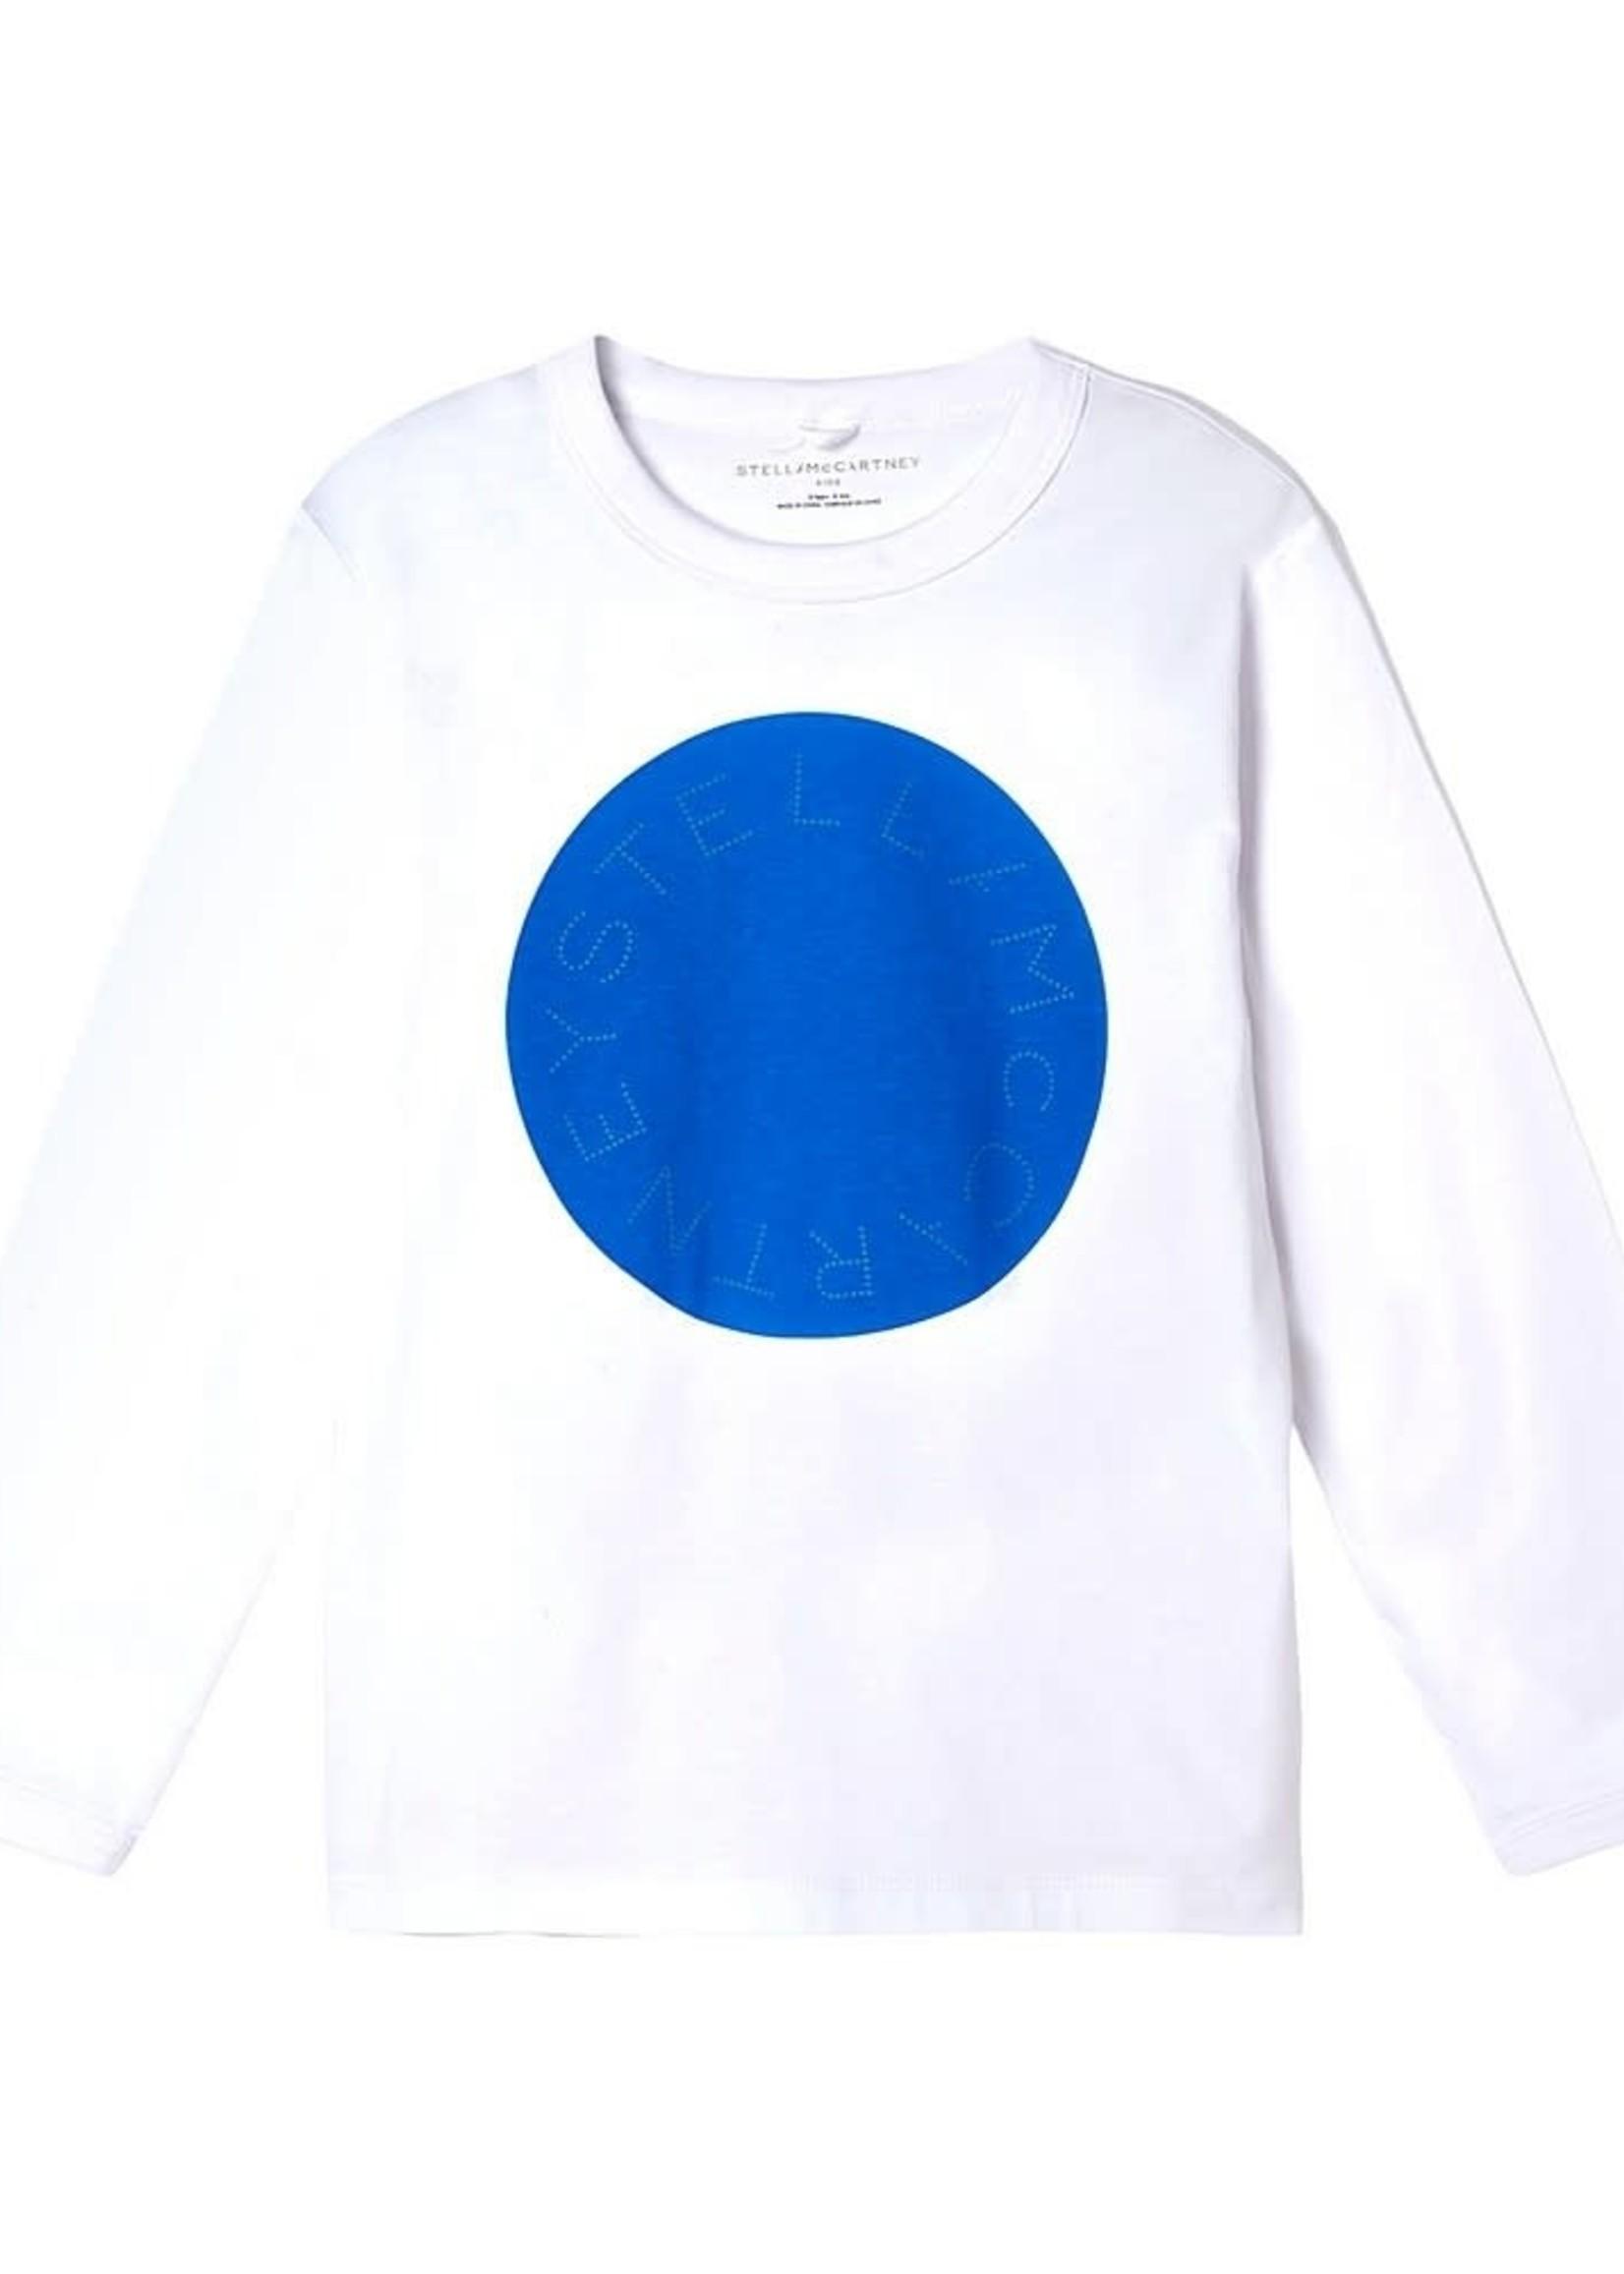 Stella McCartney Stella Mccartney-AW21 Kid Boy Ls Circle Logo Tee   603086 SRJ81